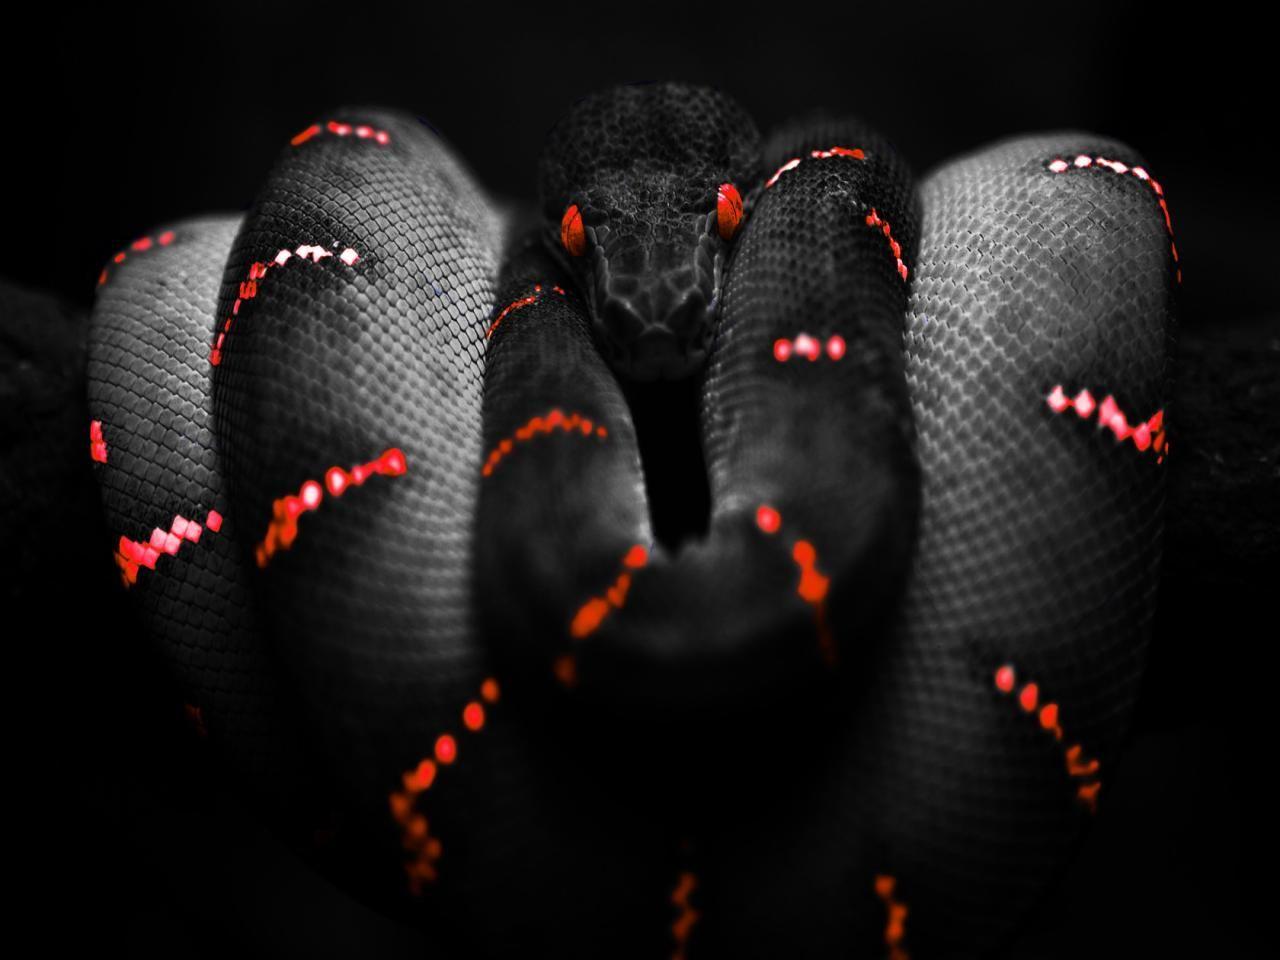 cool snake bro Snake wallpaper, Cool snakes, Colorful snakes